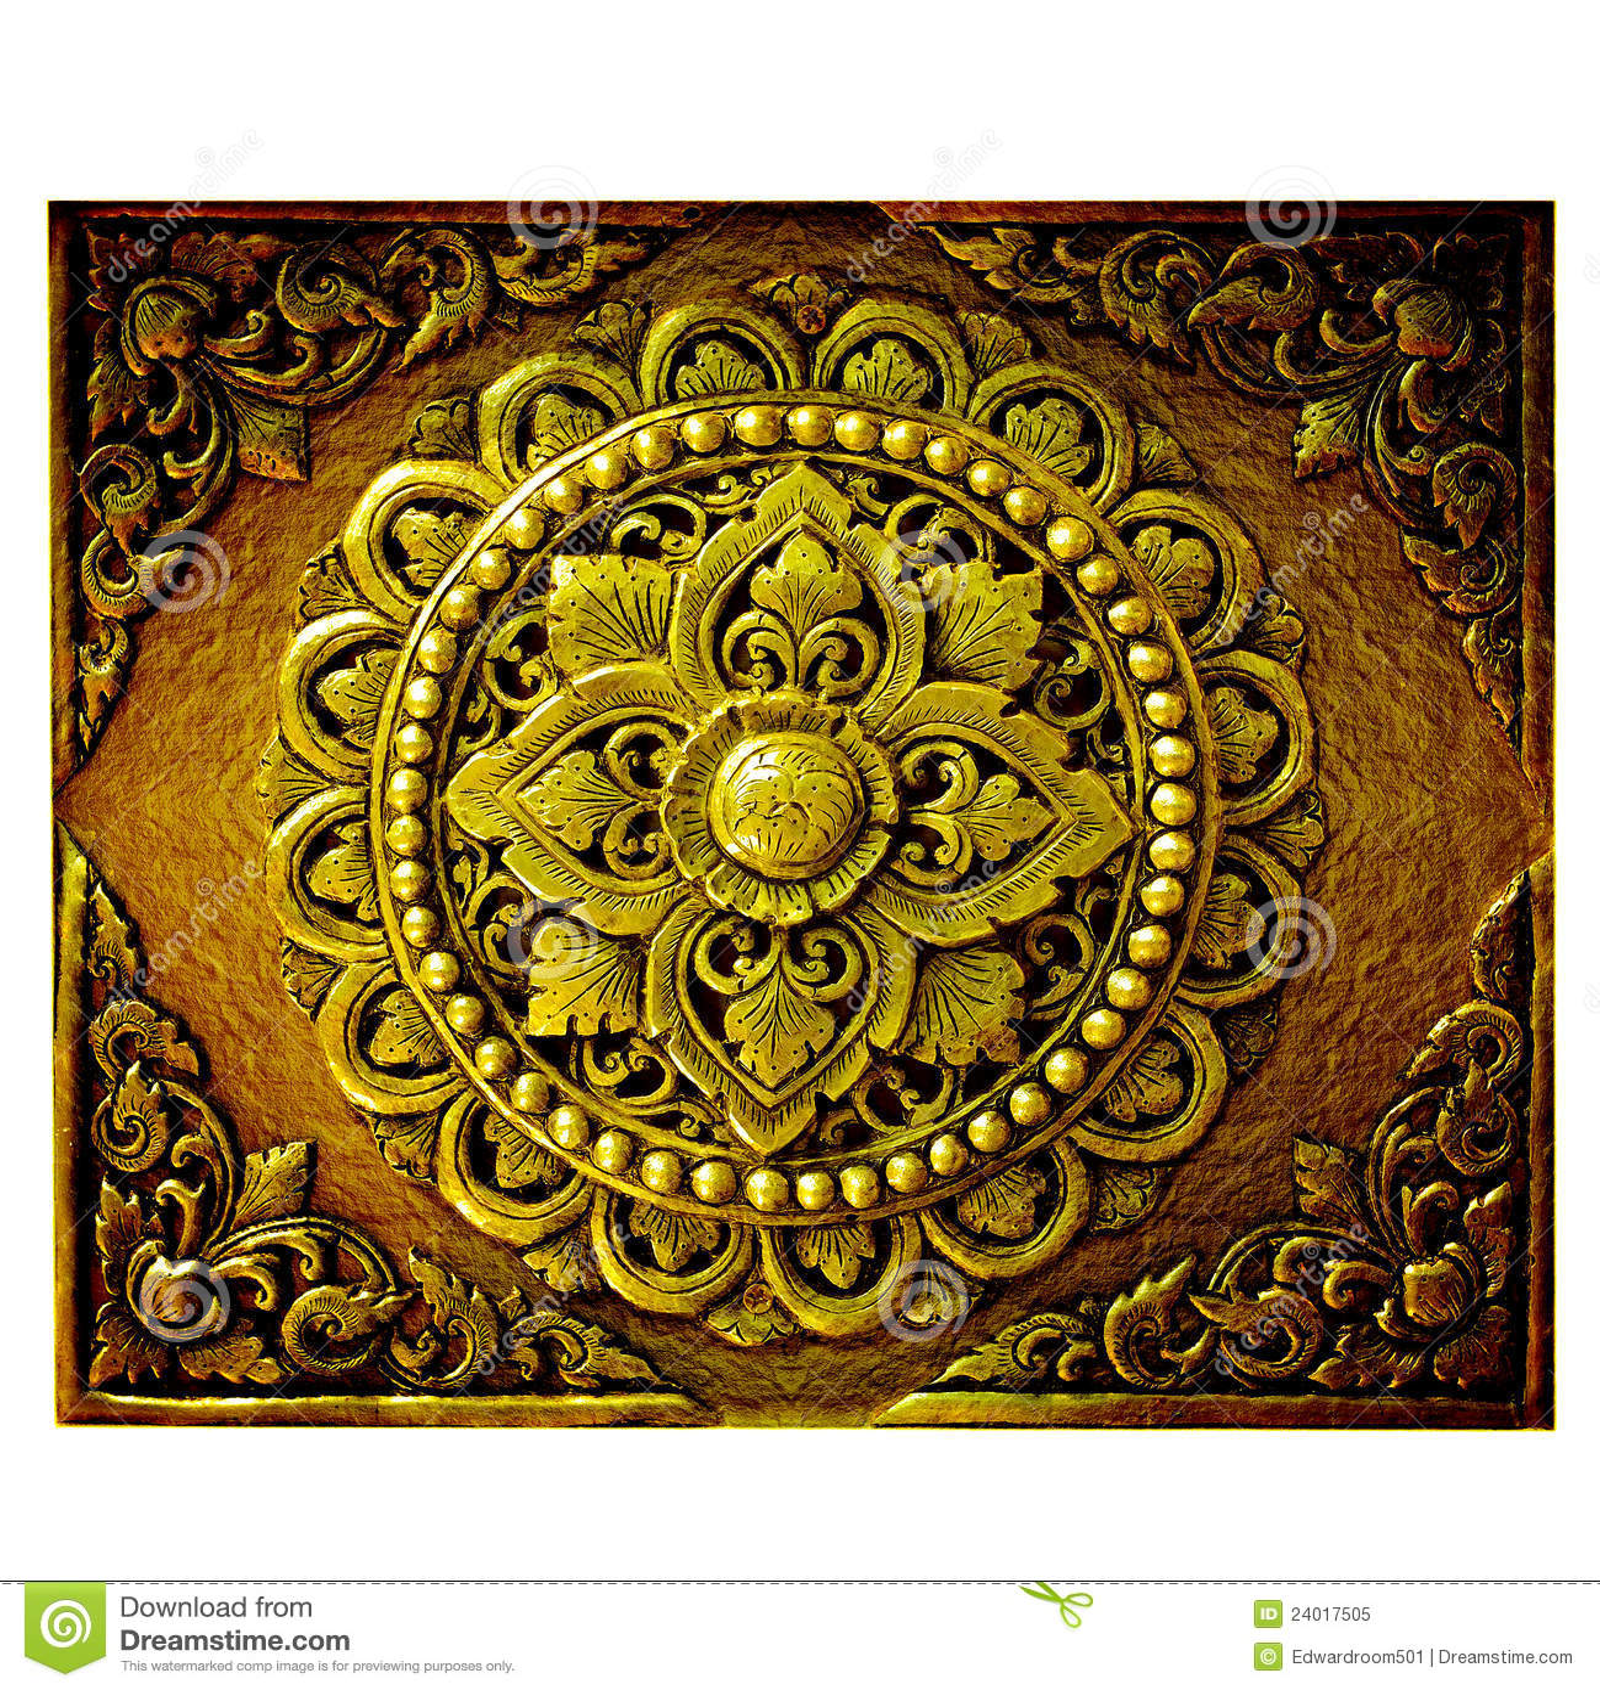 art - Decorative Art